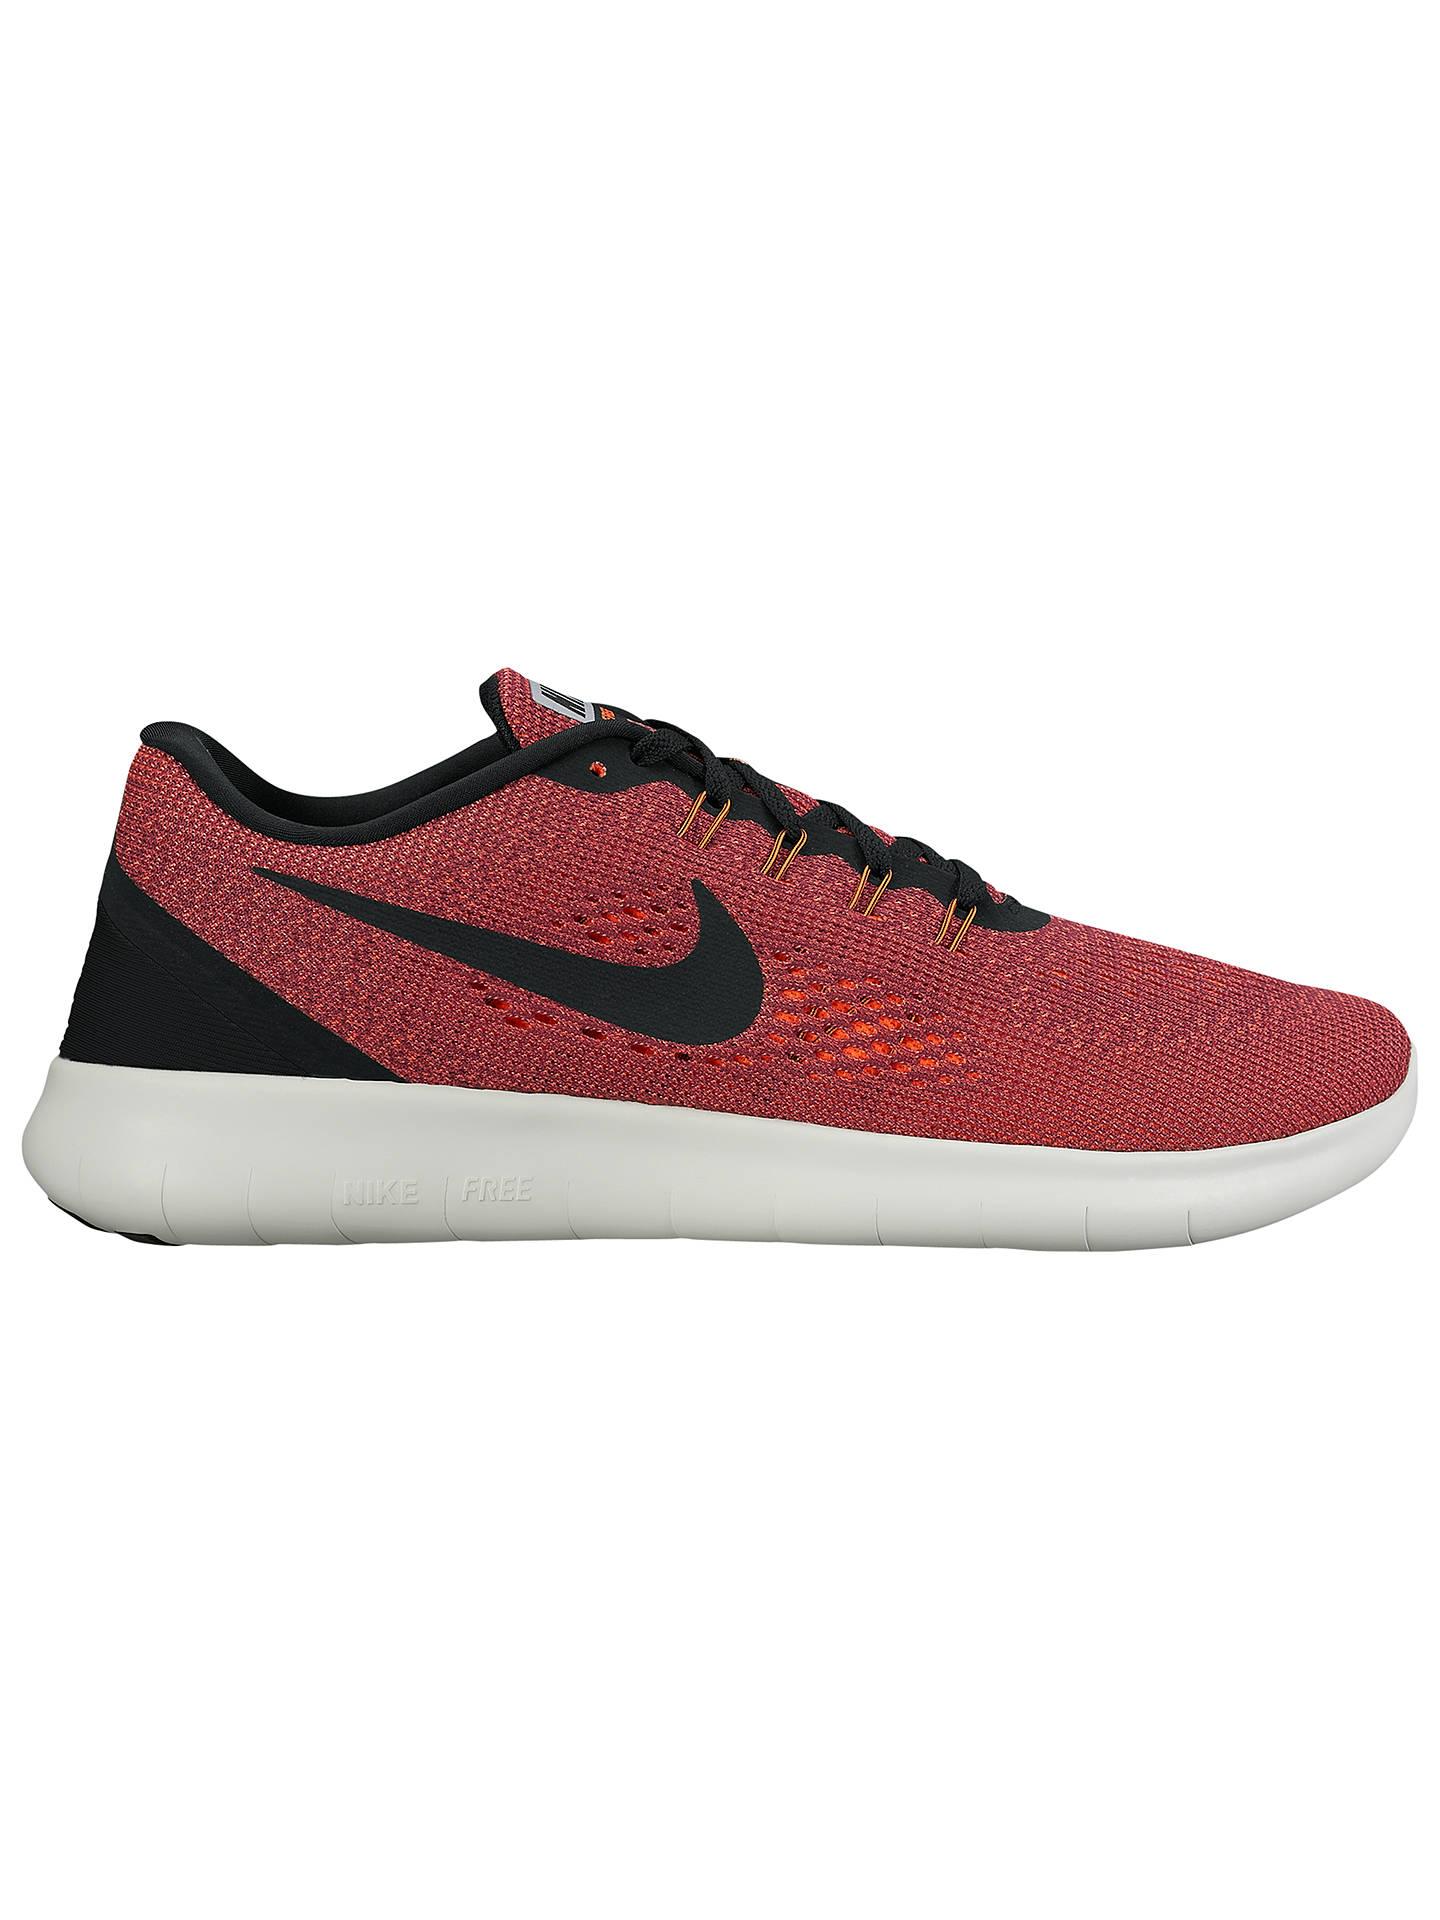 5b490db8f9fe Nike Free RN Men s Running Shoes at John Lewis   Partners